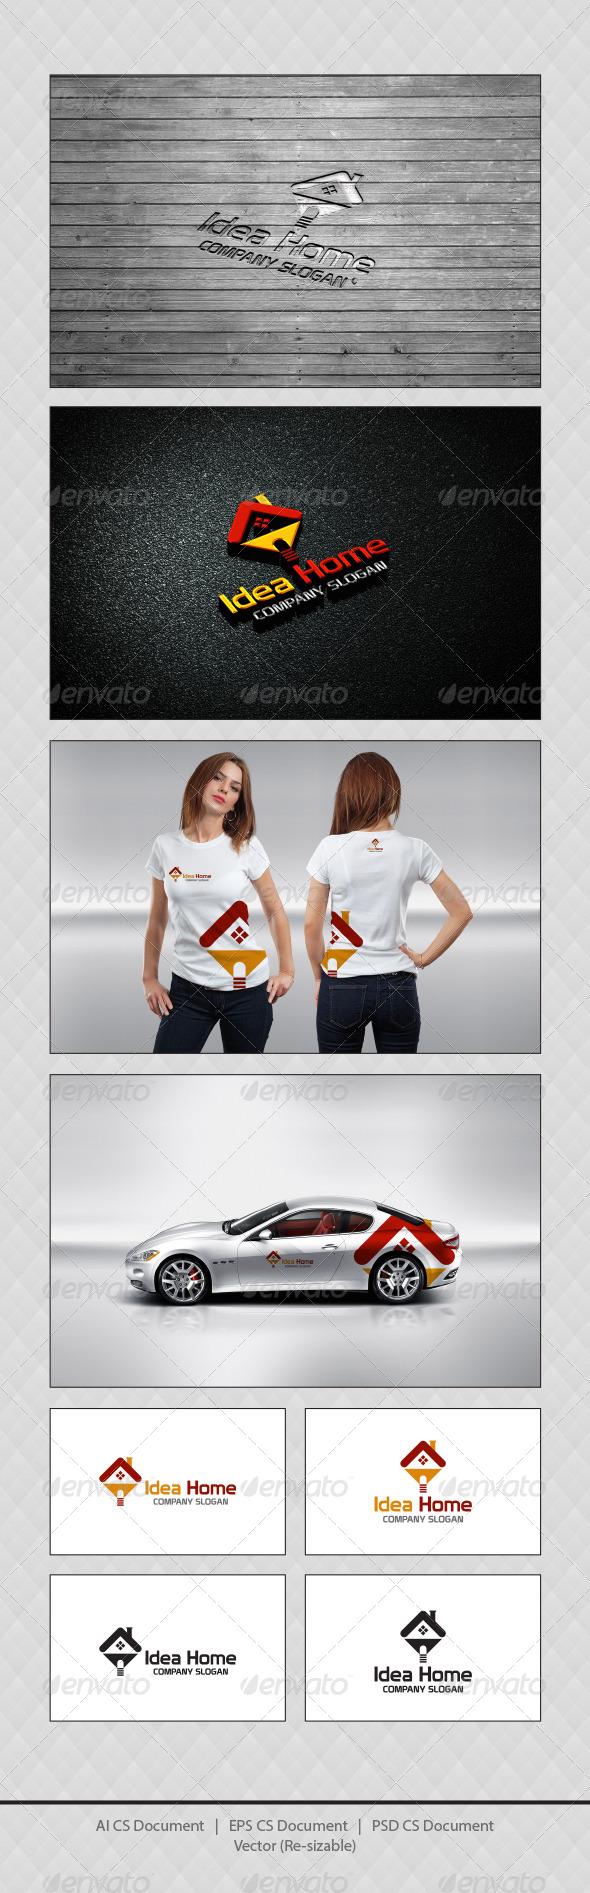 GraphicRiver Idea Home Logo Templates 4377631